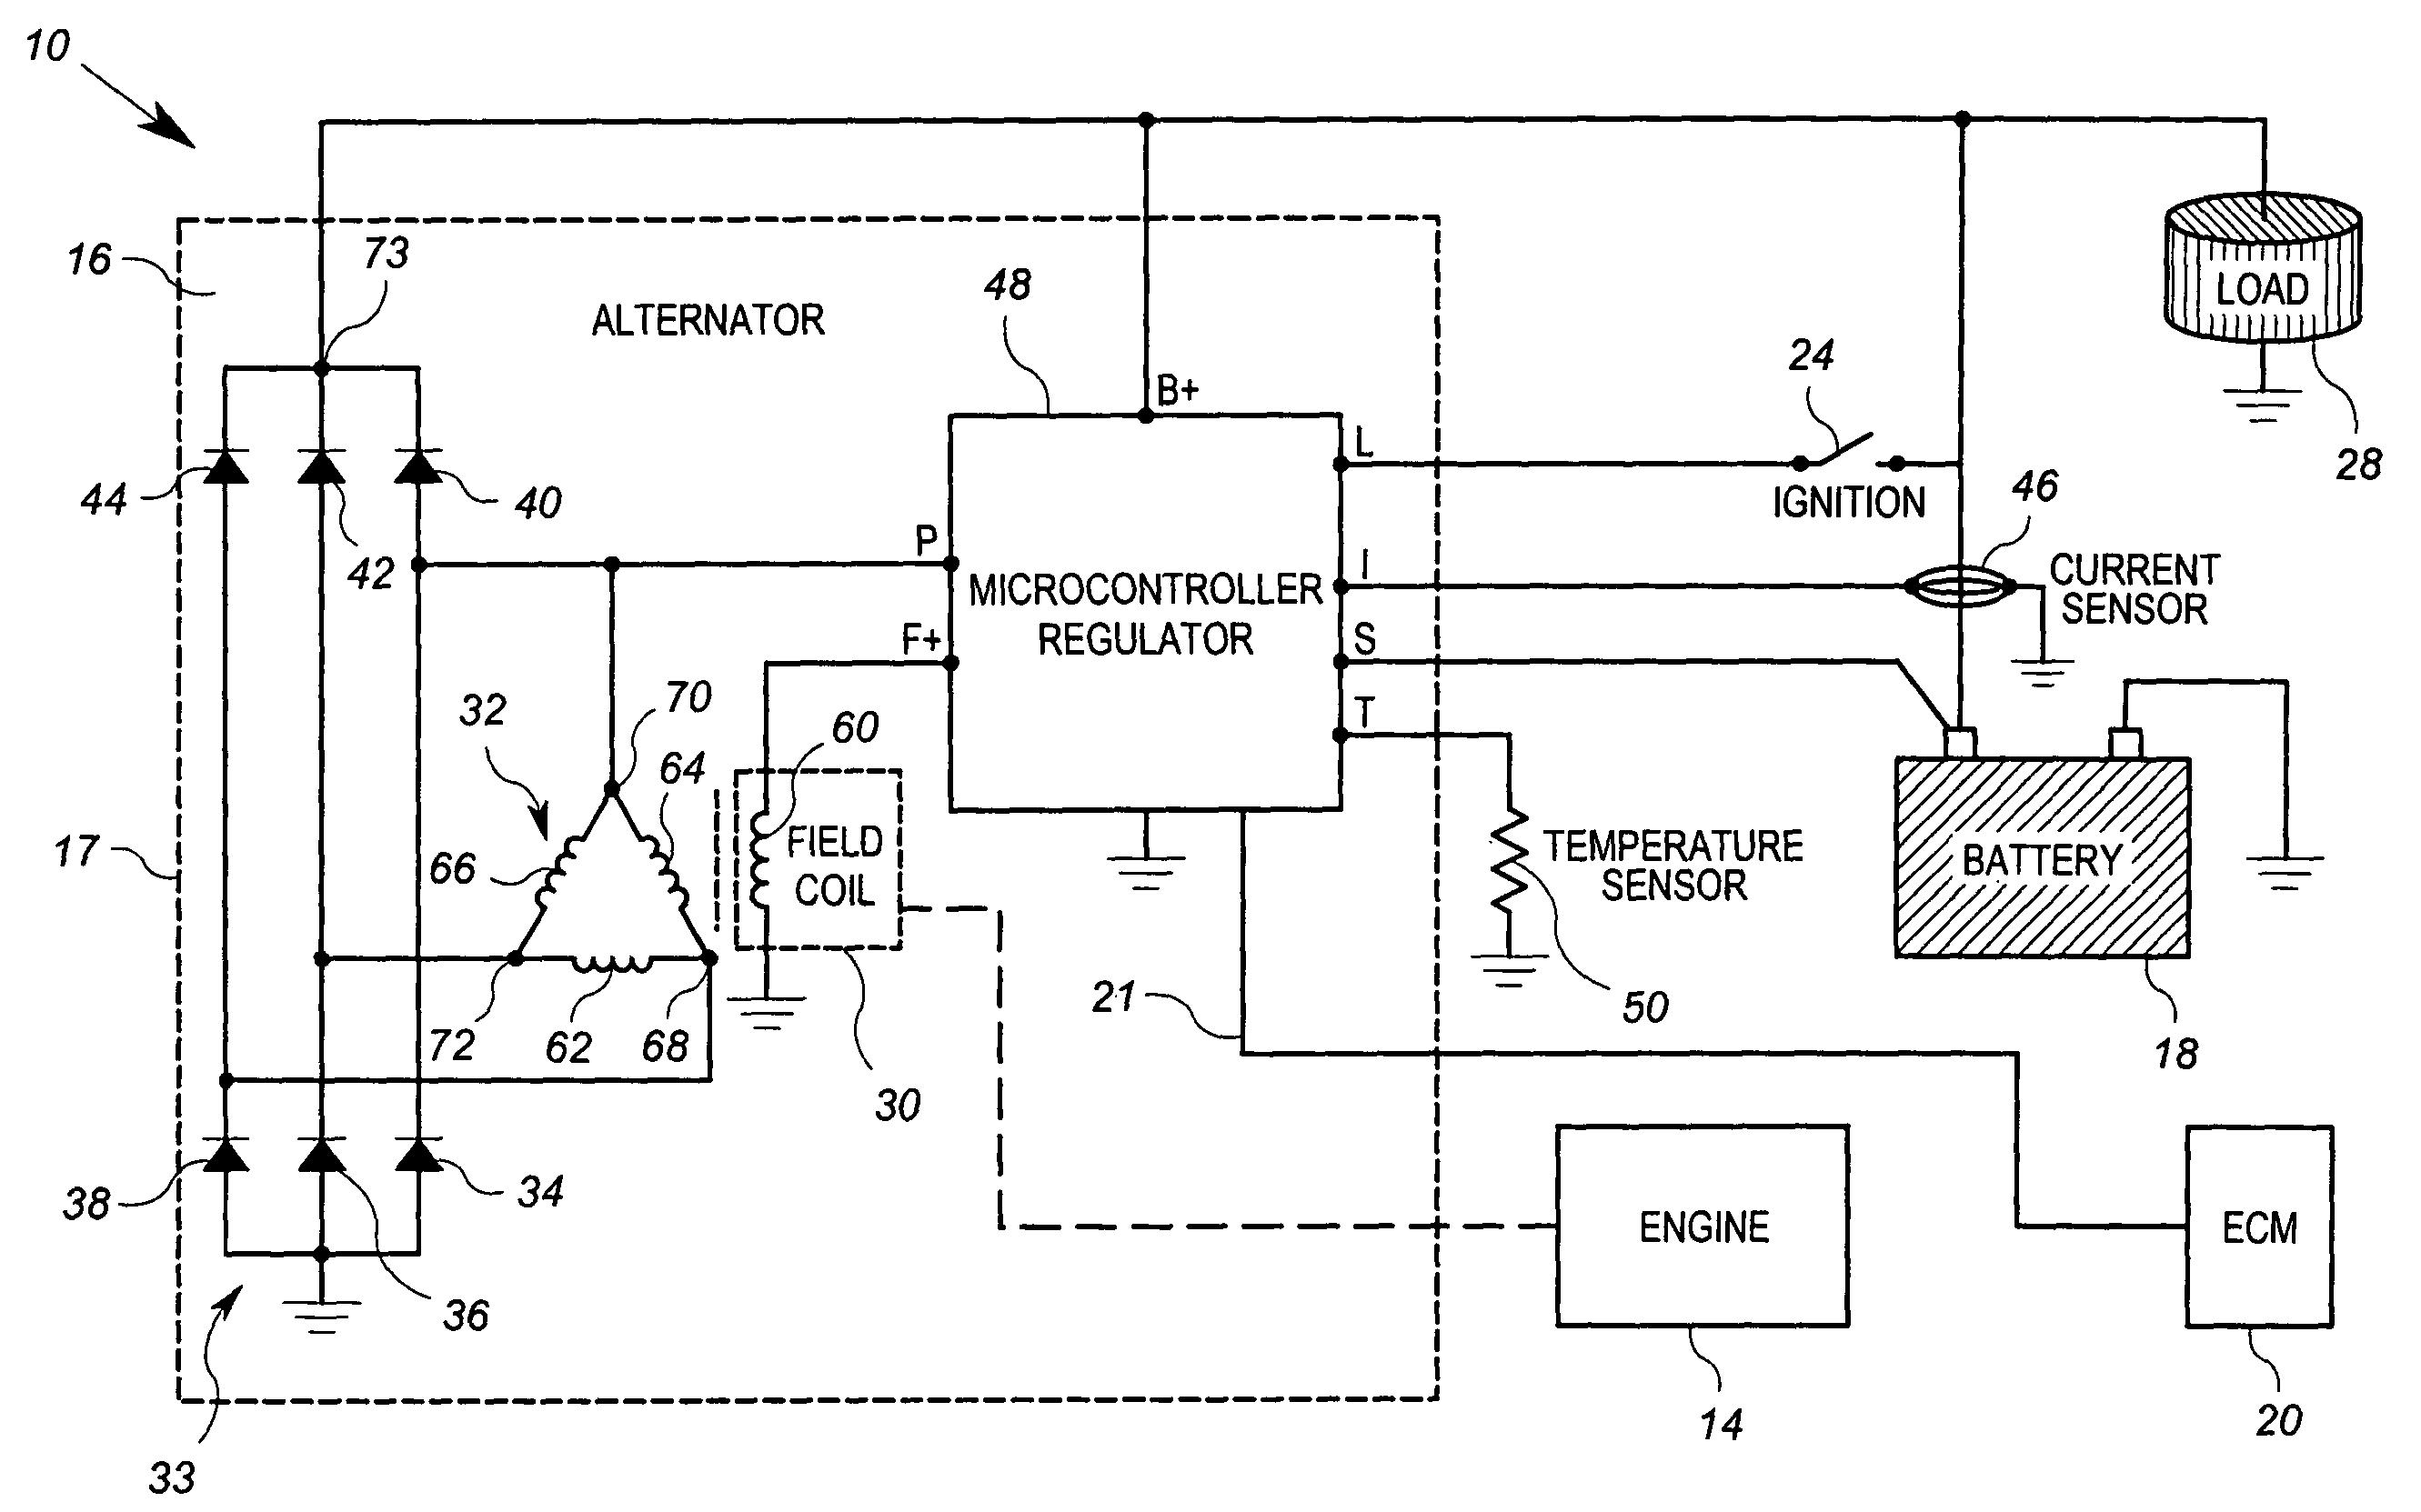 Patent US8330430 - Alternator regulator with variable rotor field ...